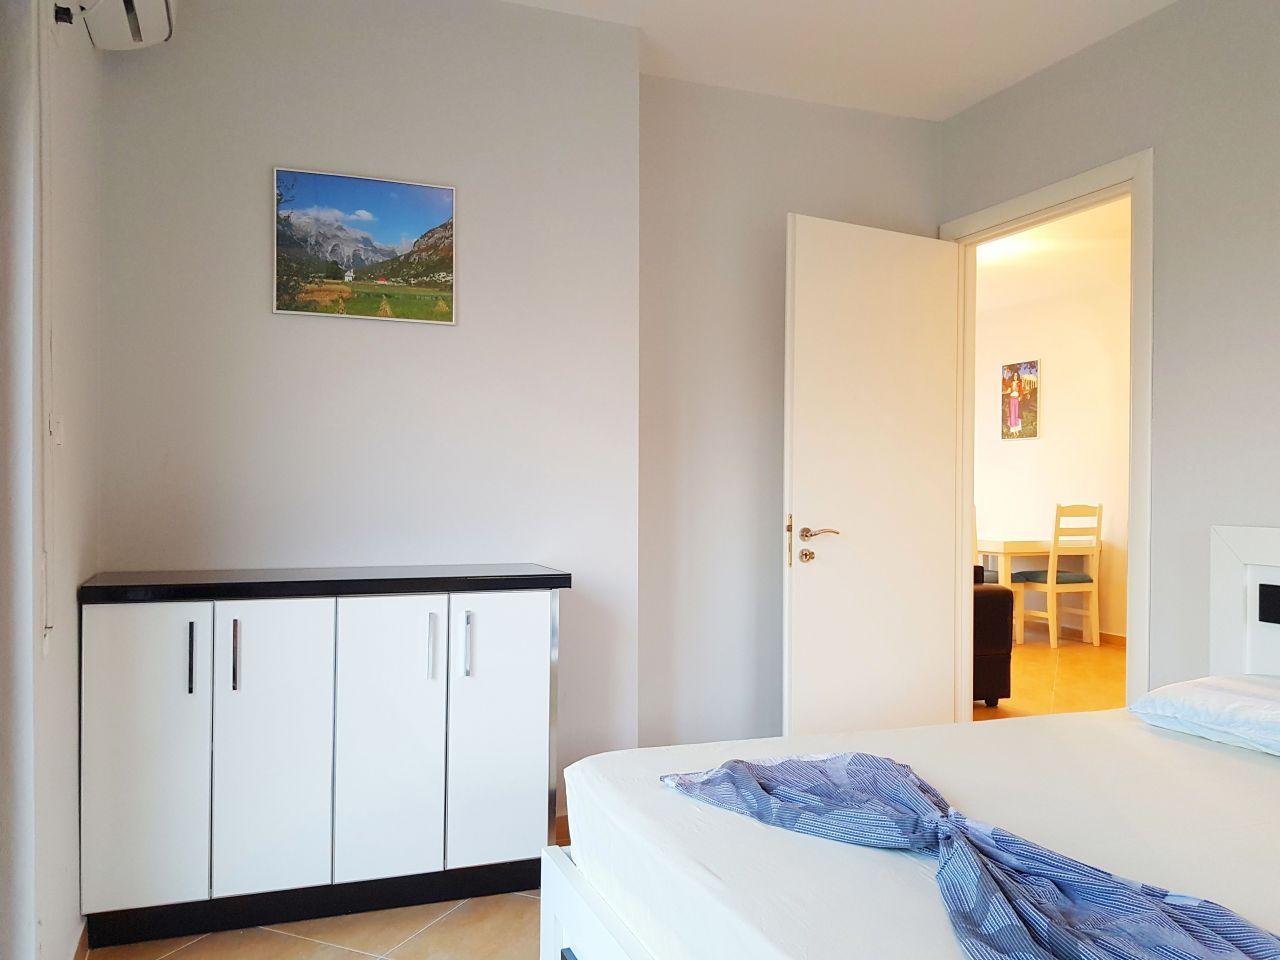 Apartment for Sale in Albania, Durres. Buy Apartment in Albania